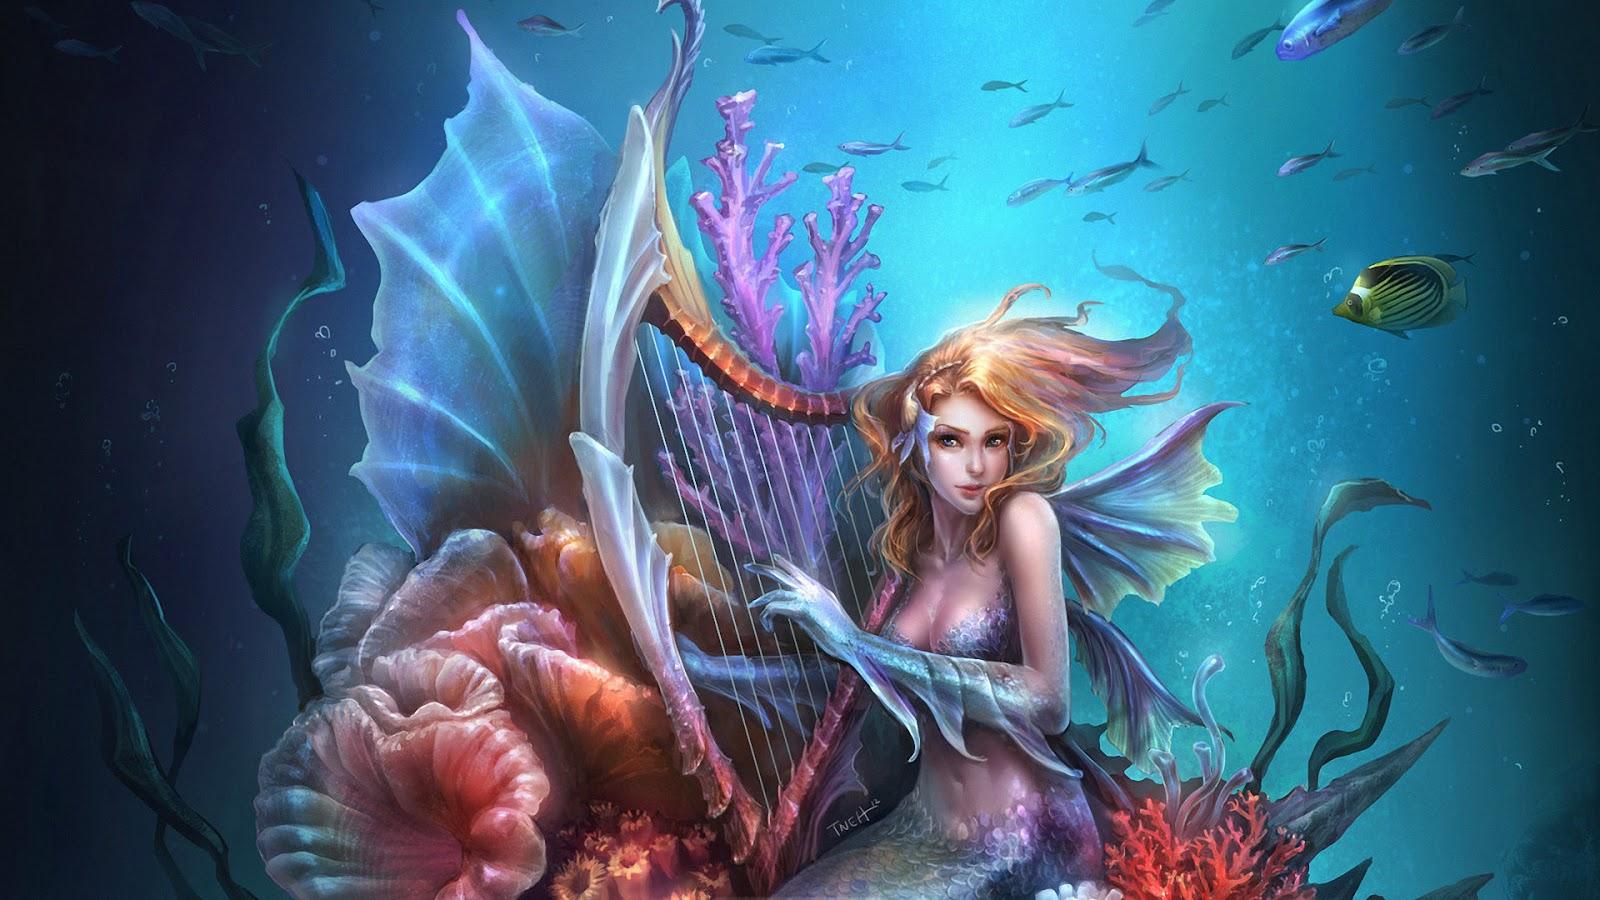 mermaid-queen-playing-music-beauty-sea-fish.jpg